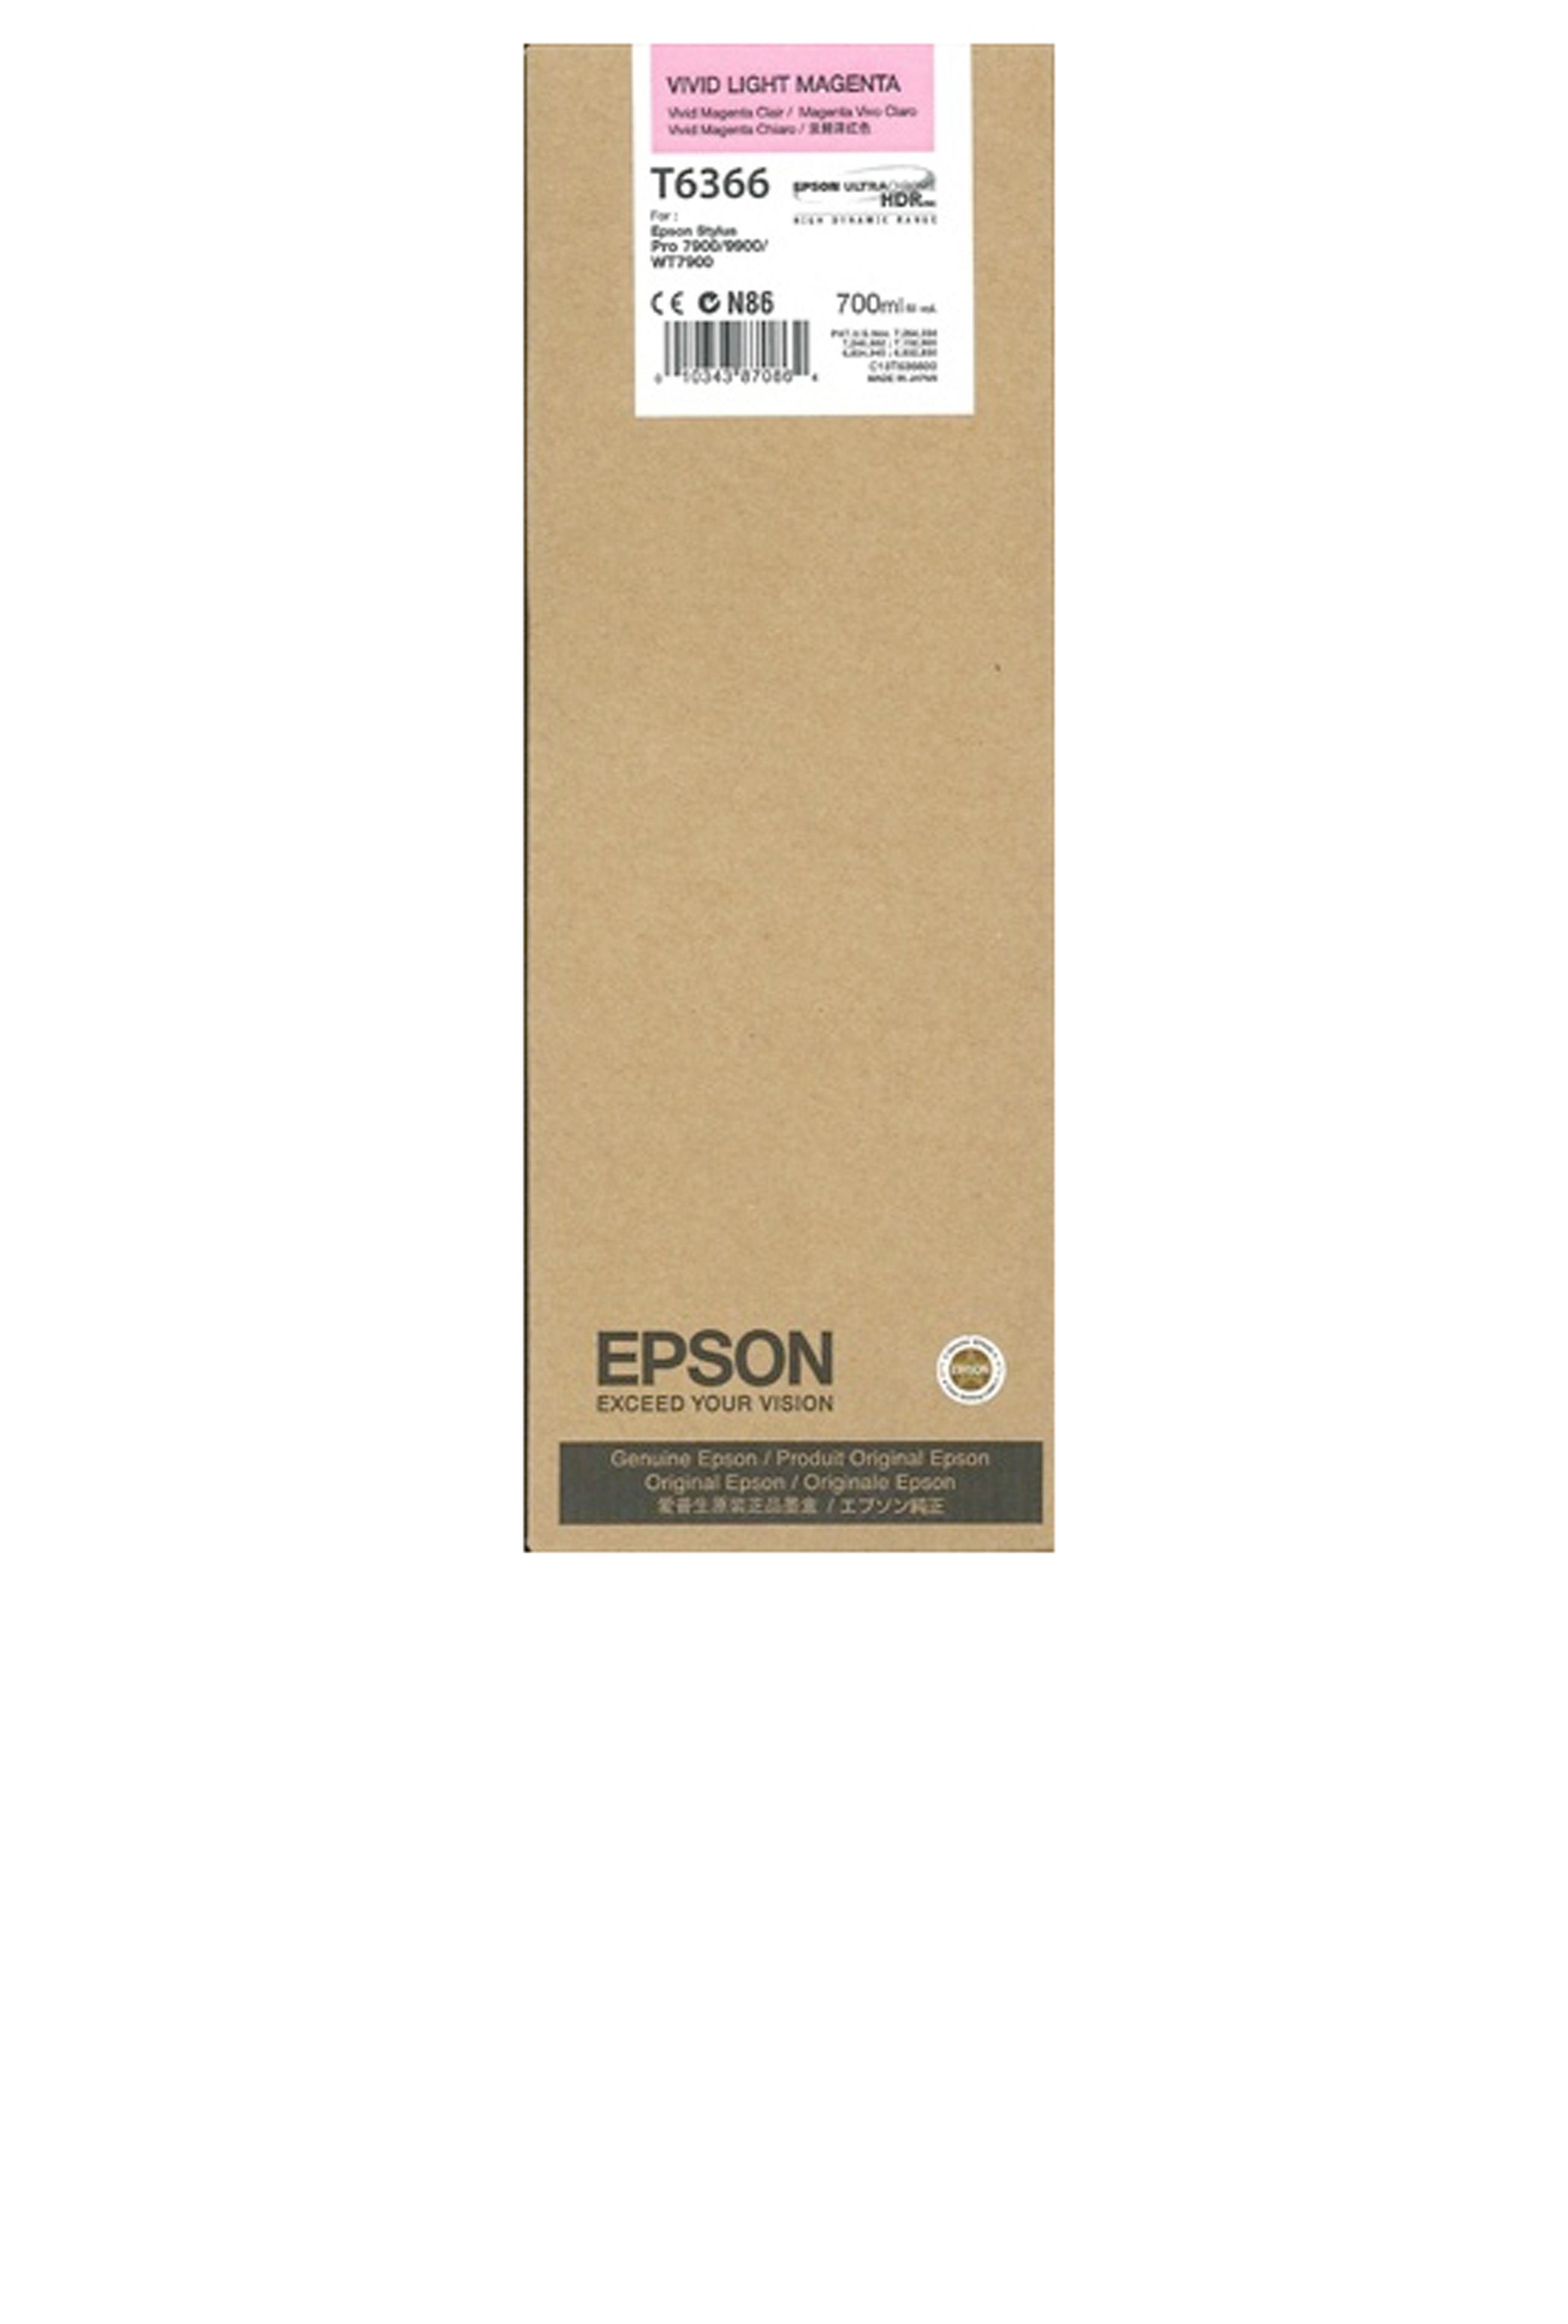 Epson EPSON HI VIVID LT MAGENTA (700 ML) (T636600)